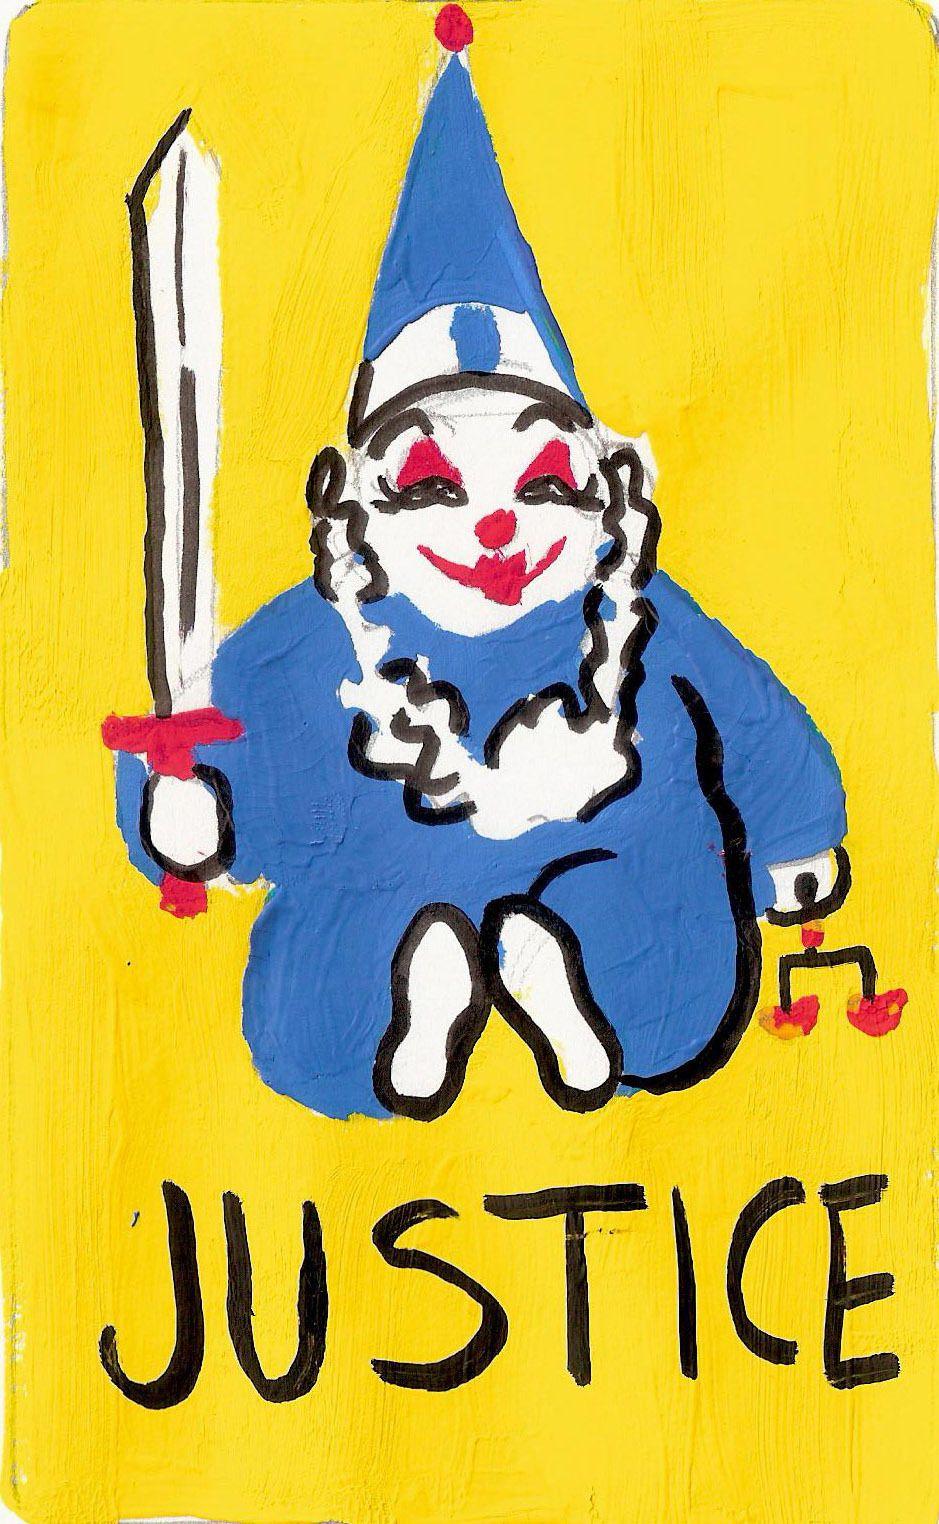 clown tarot | Cute clown, Clown, Art